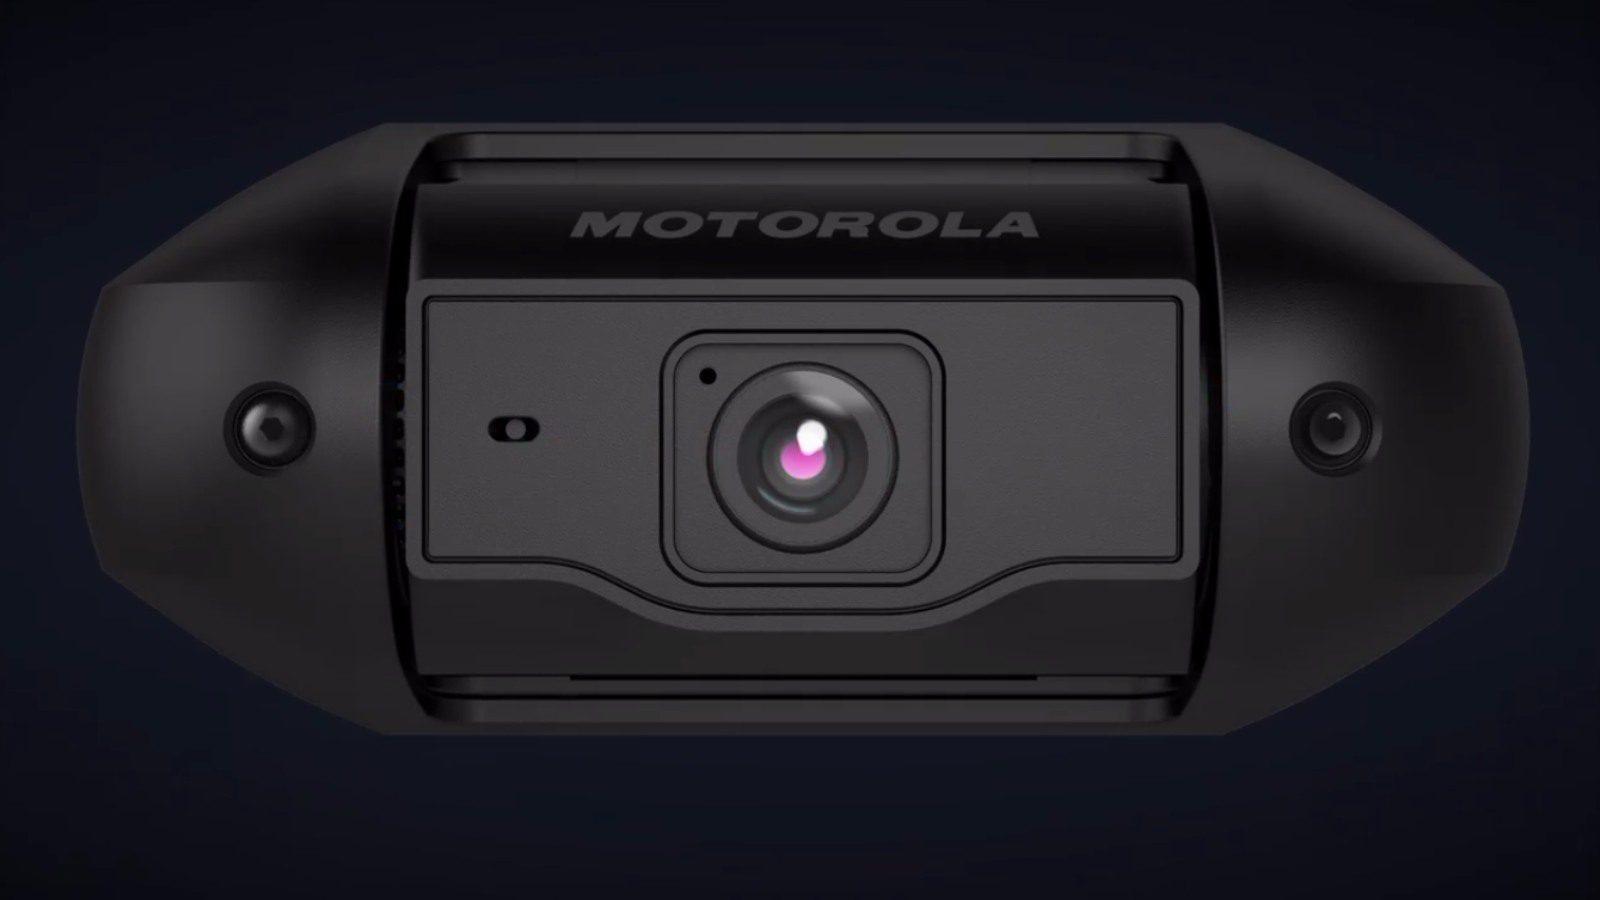 Motorola in car video system